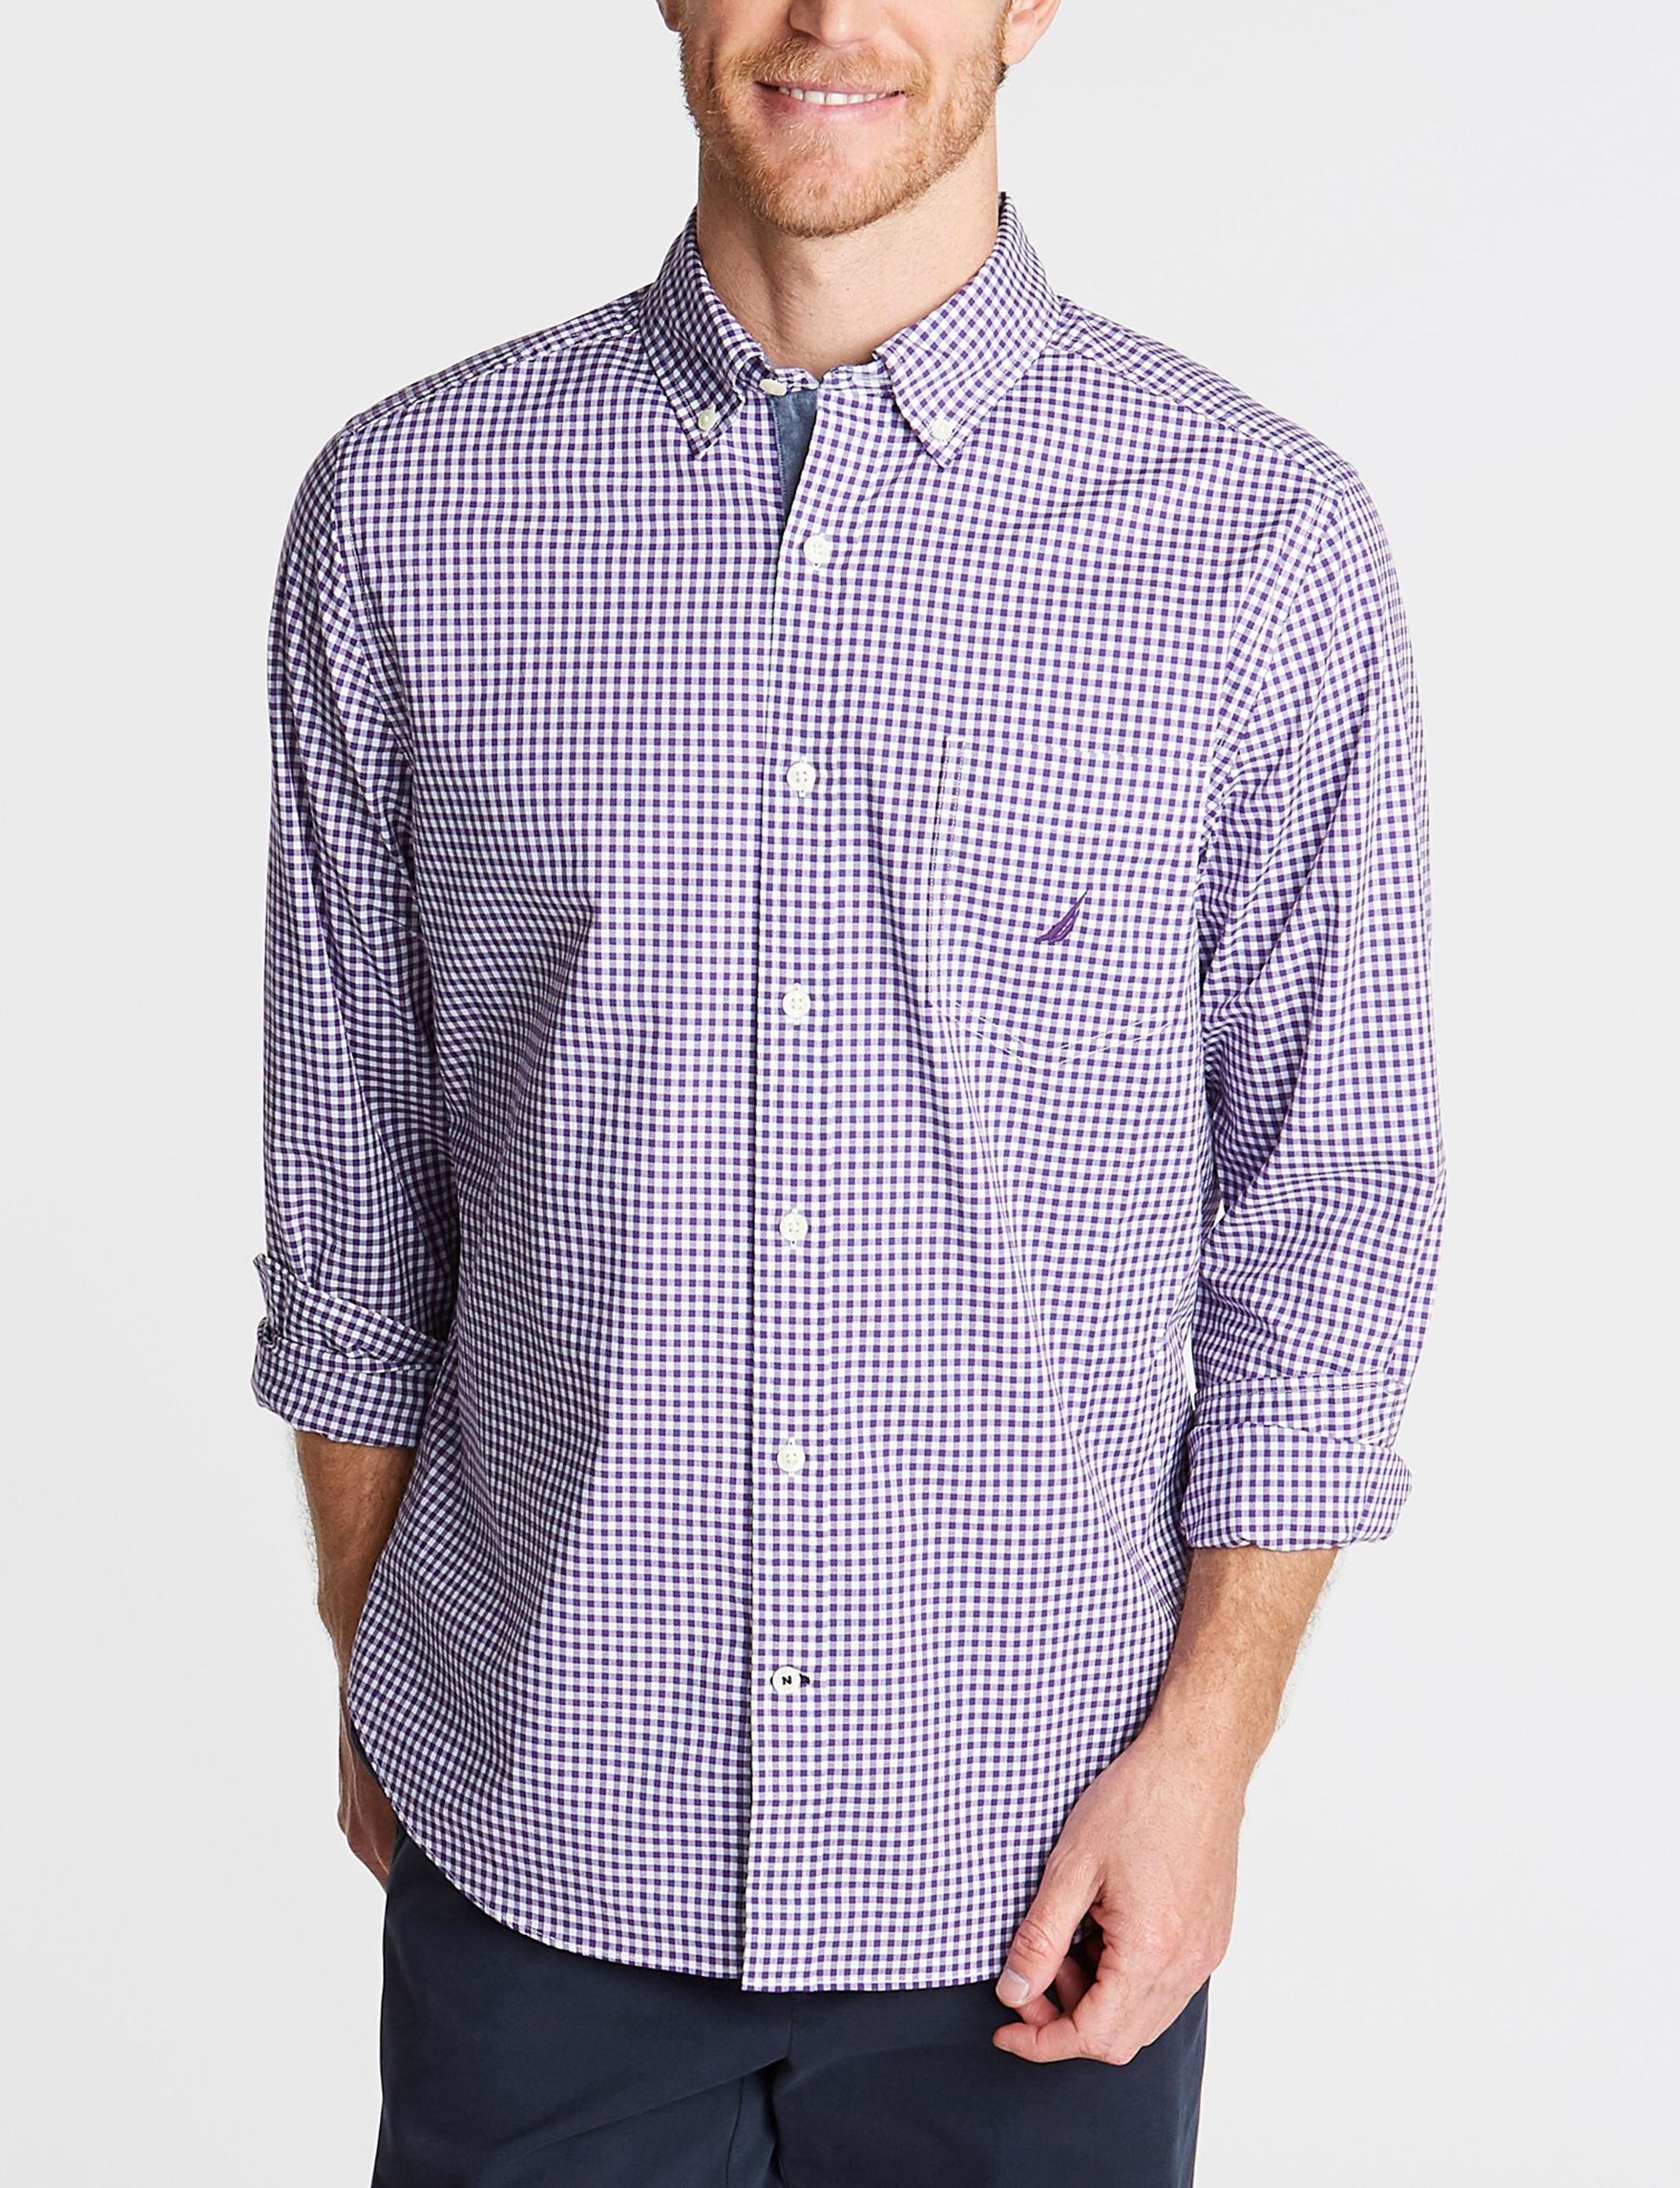 Nautica Majestic Purple Casual Button Down Shirts